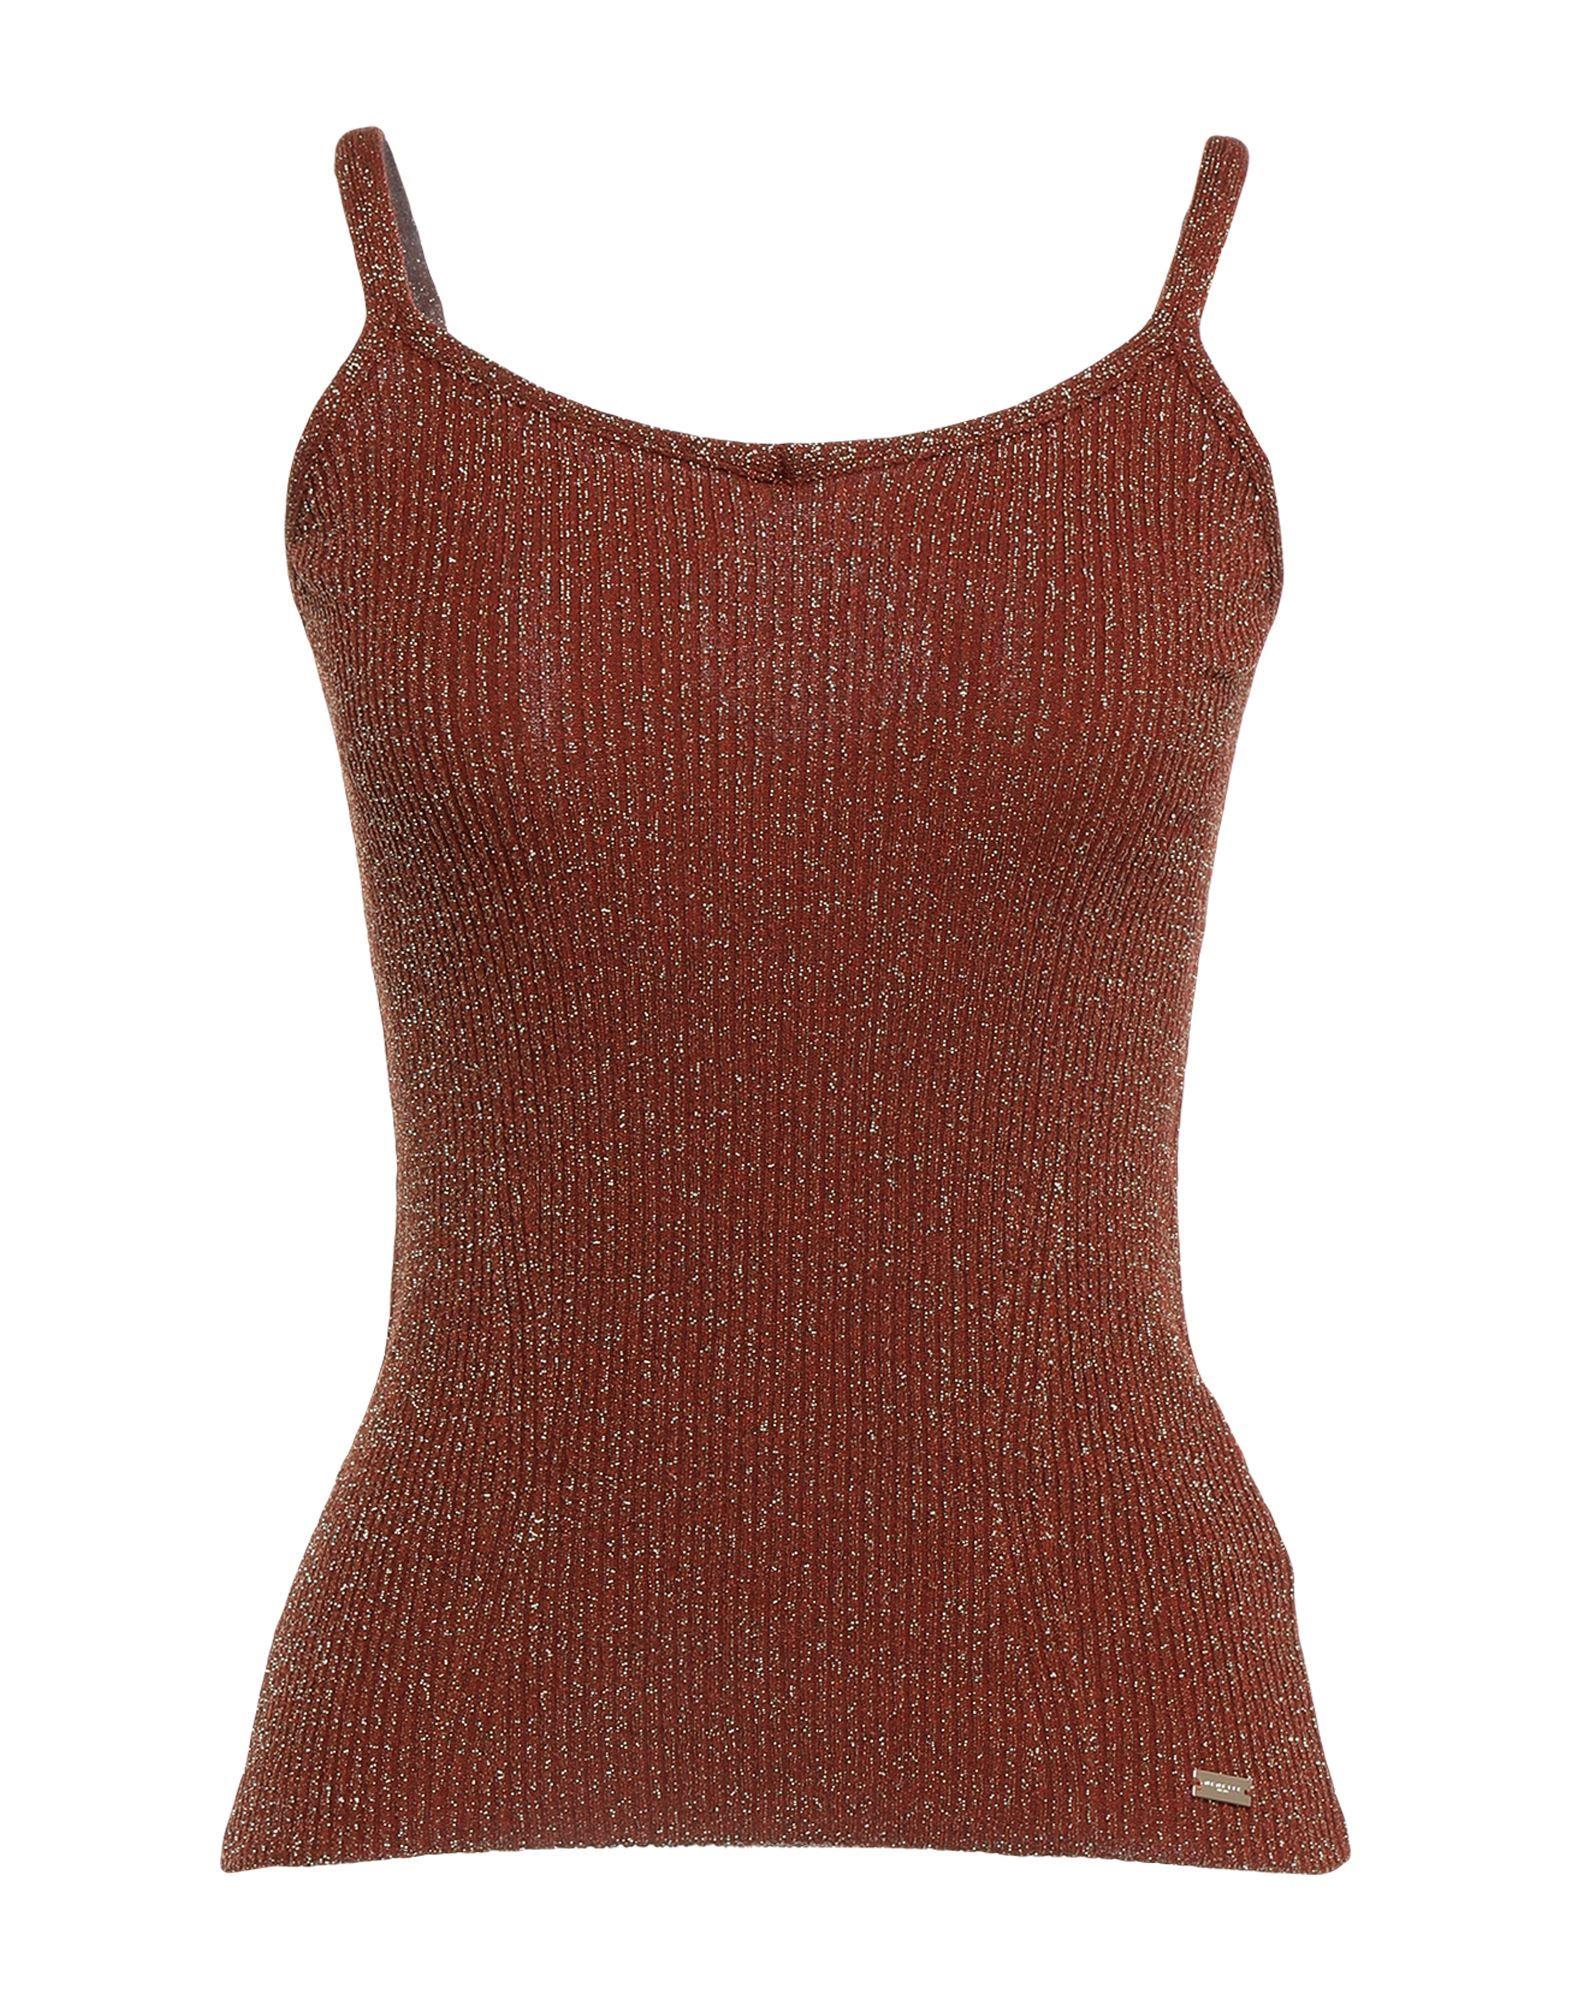 Nenette Brown Stretch Camisole